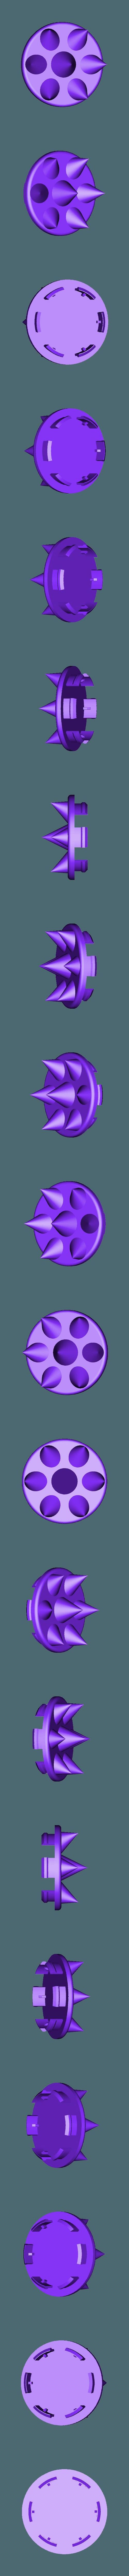 v2_spikes.stl Download free STL file Center Hub Caps • 3D printer template, B1nkfish